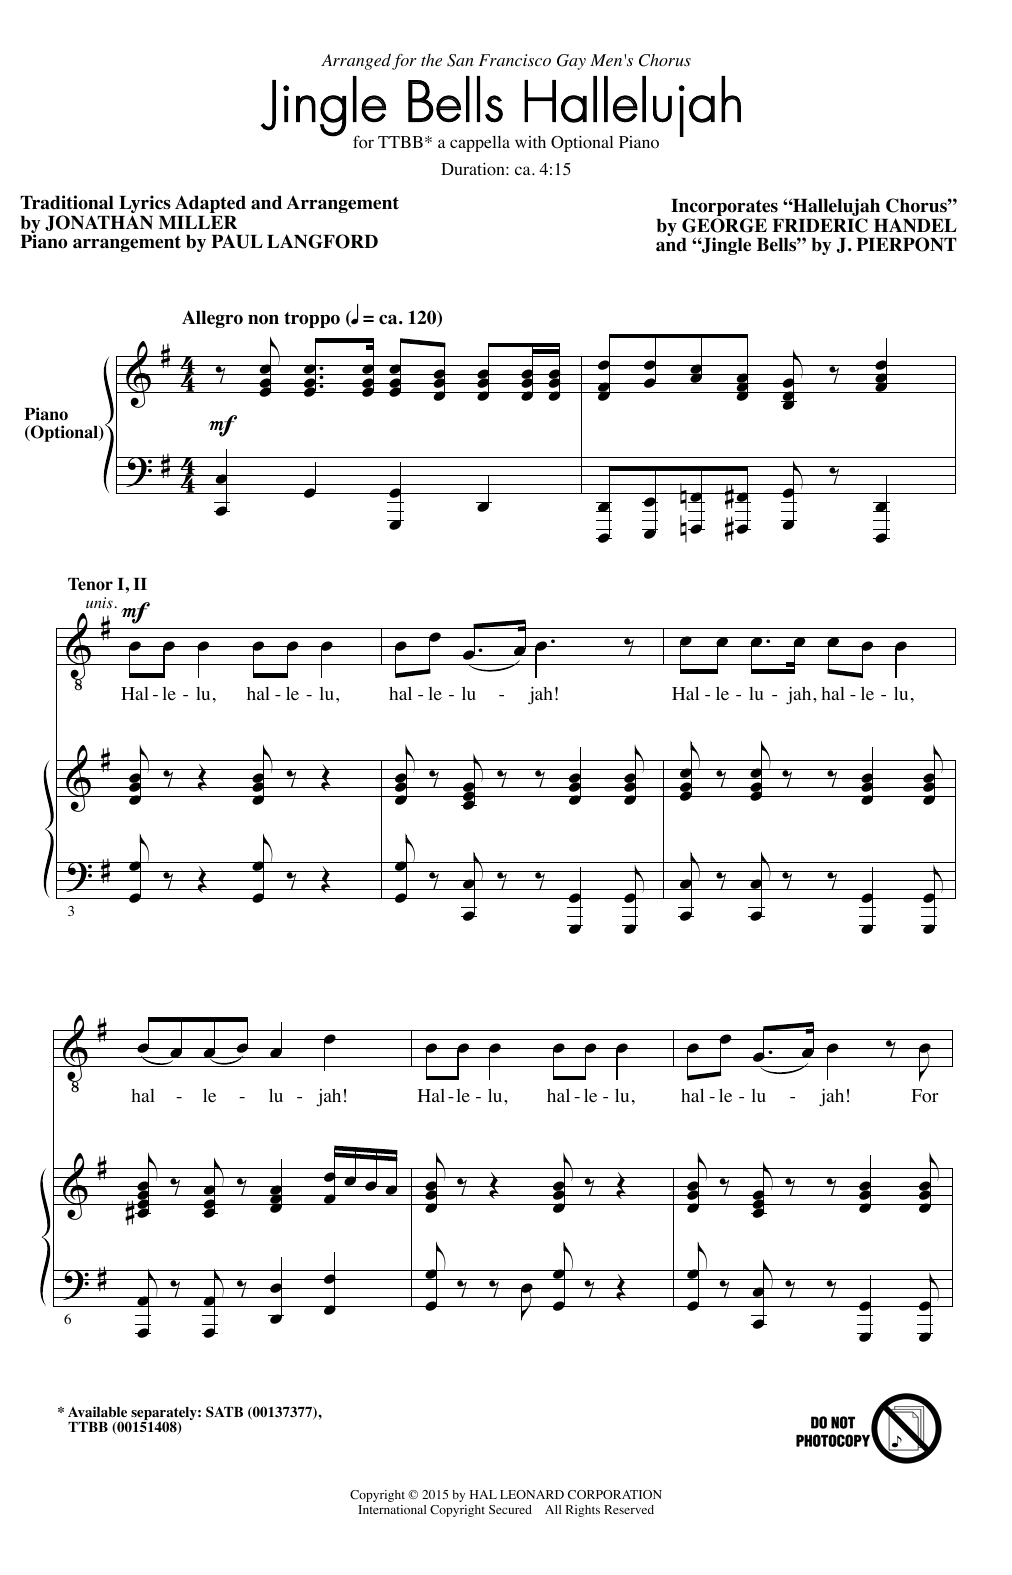 Partition chorale Hallelujah Chorus de J. Pierpont - TTBB